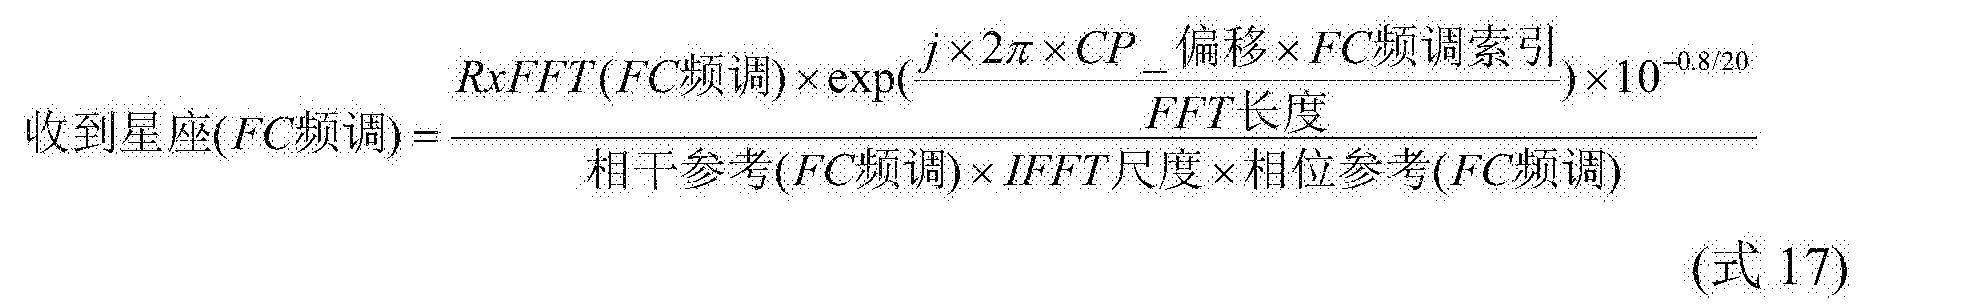 Figure CN107181660AD00331